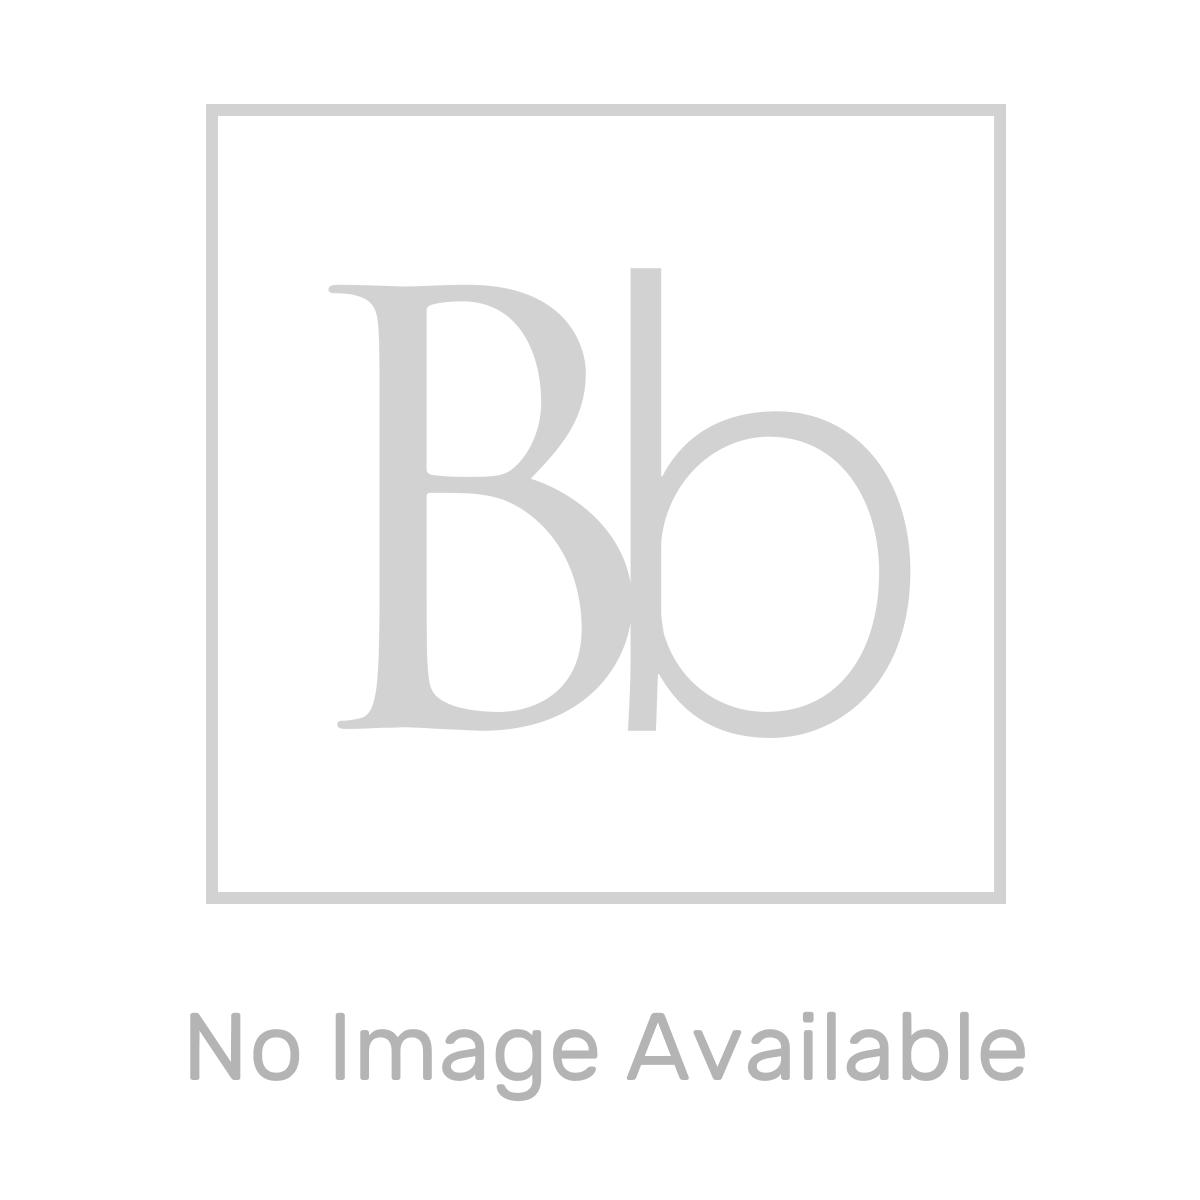 HiB Vita 60 LED Double Door Mirrored Cabinet